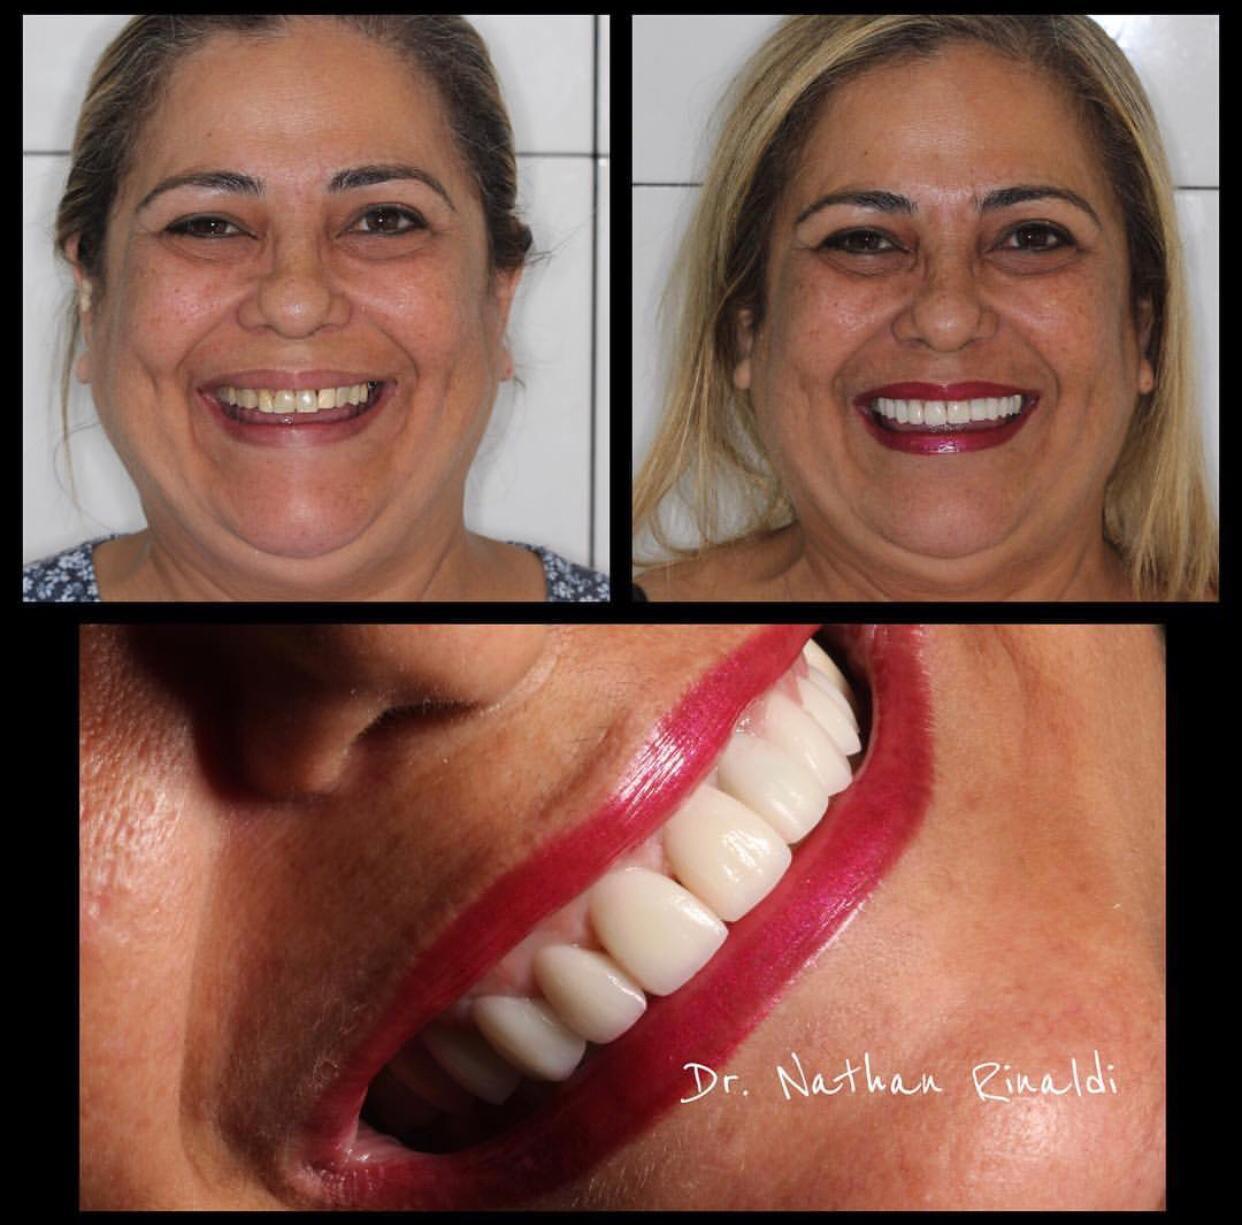 Estética – Lentes de Contato Dentais